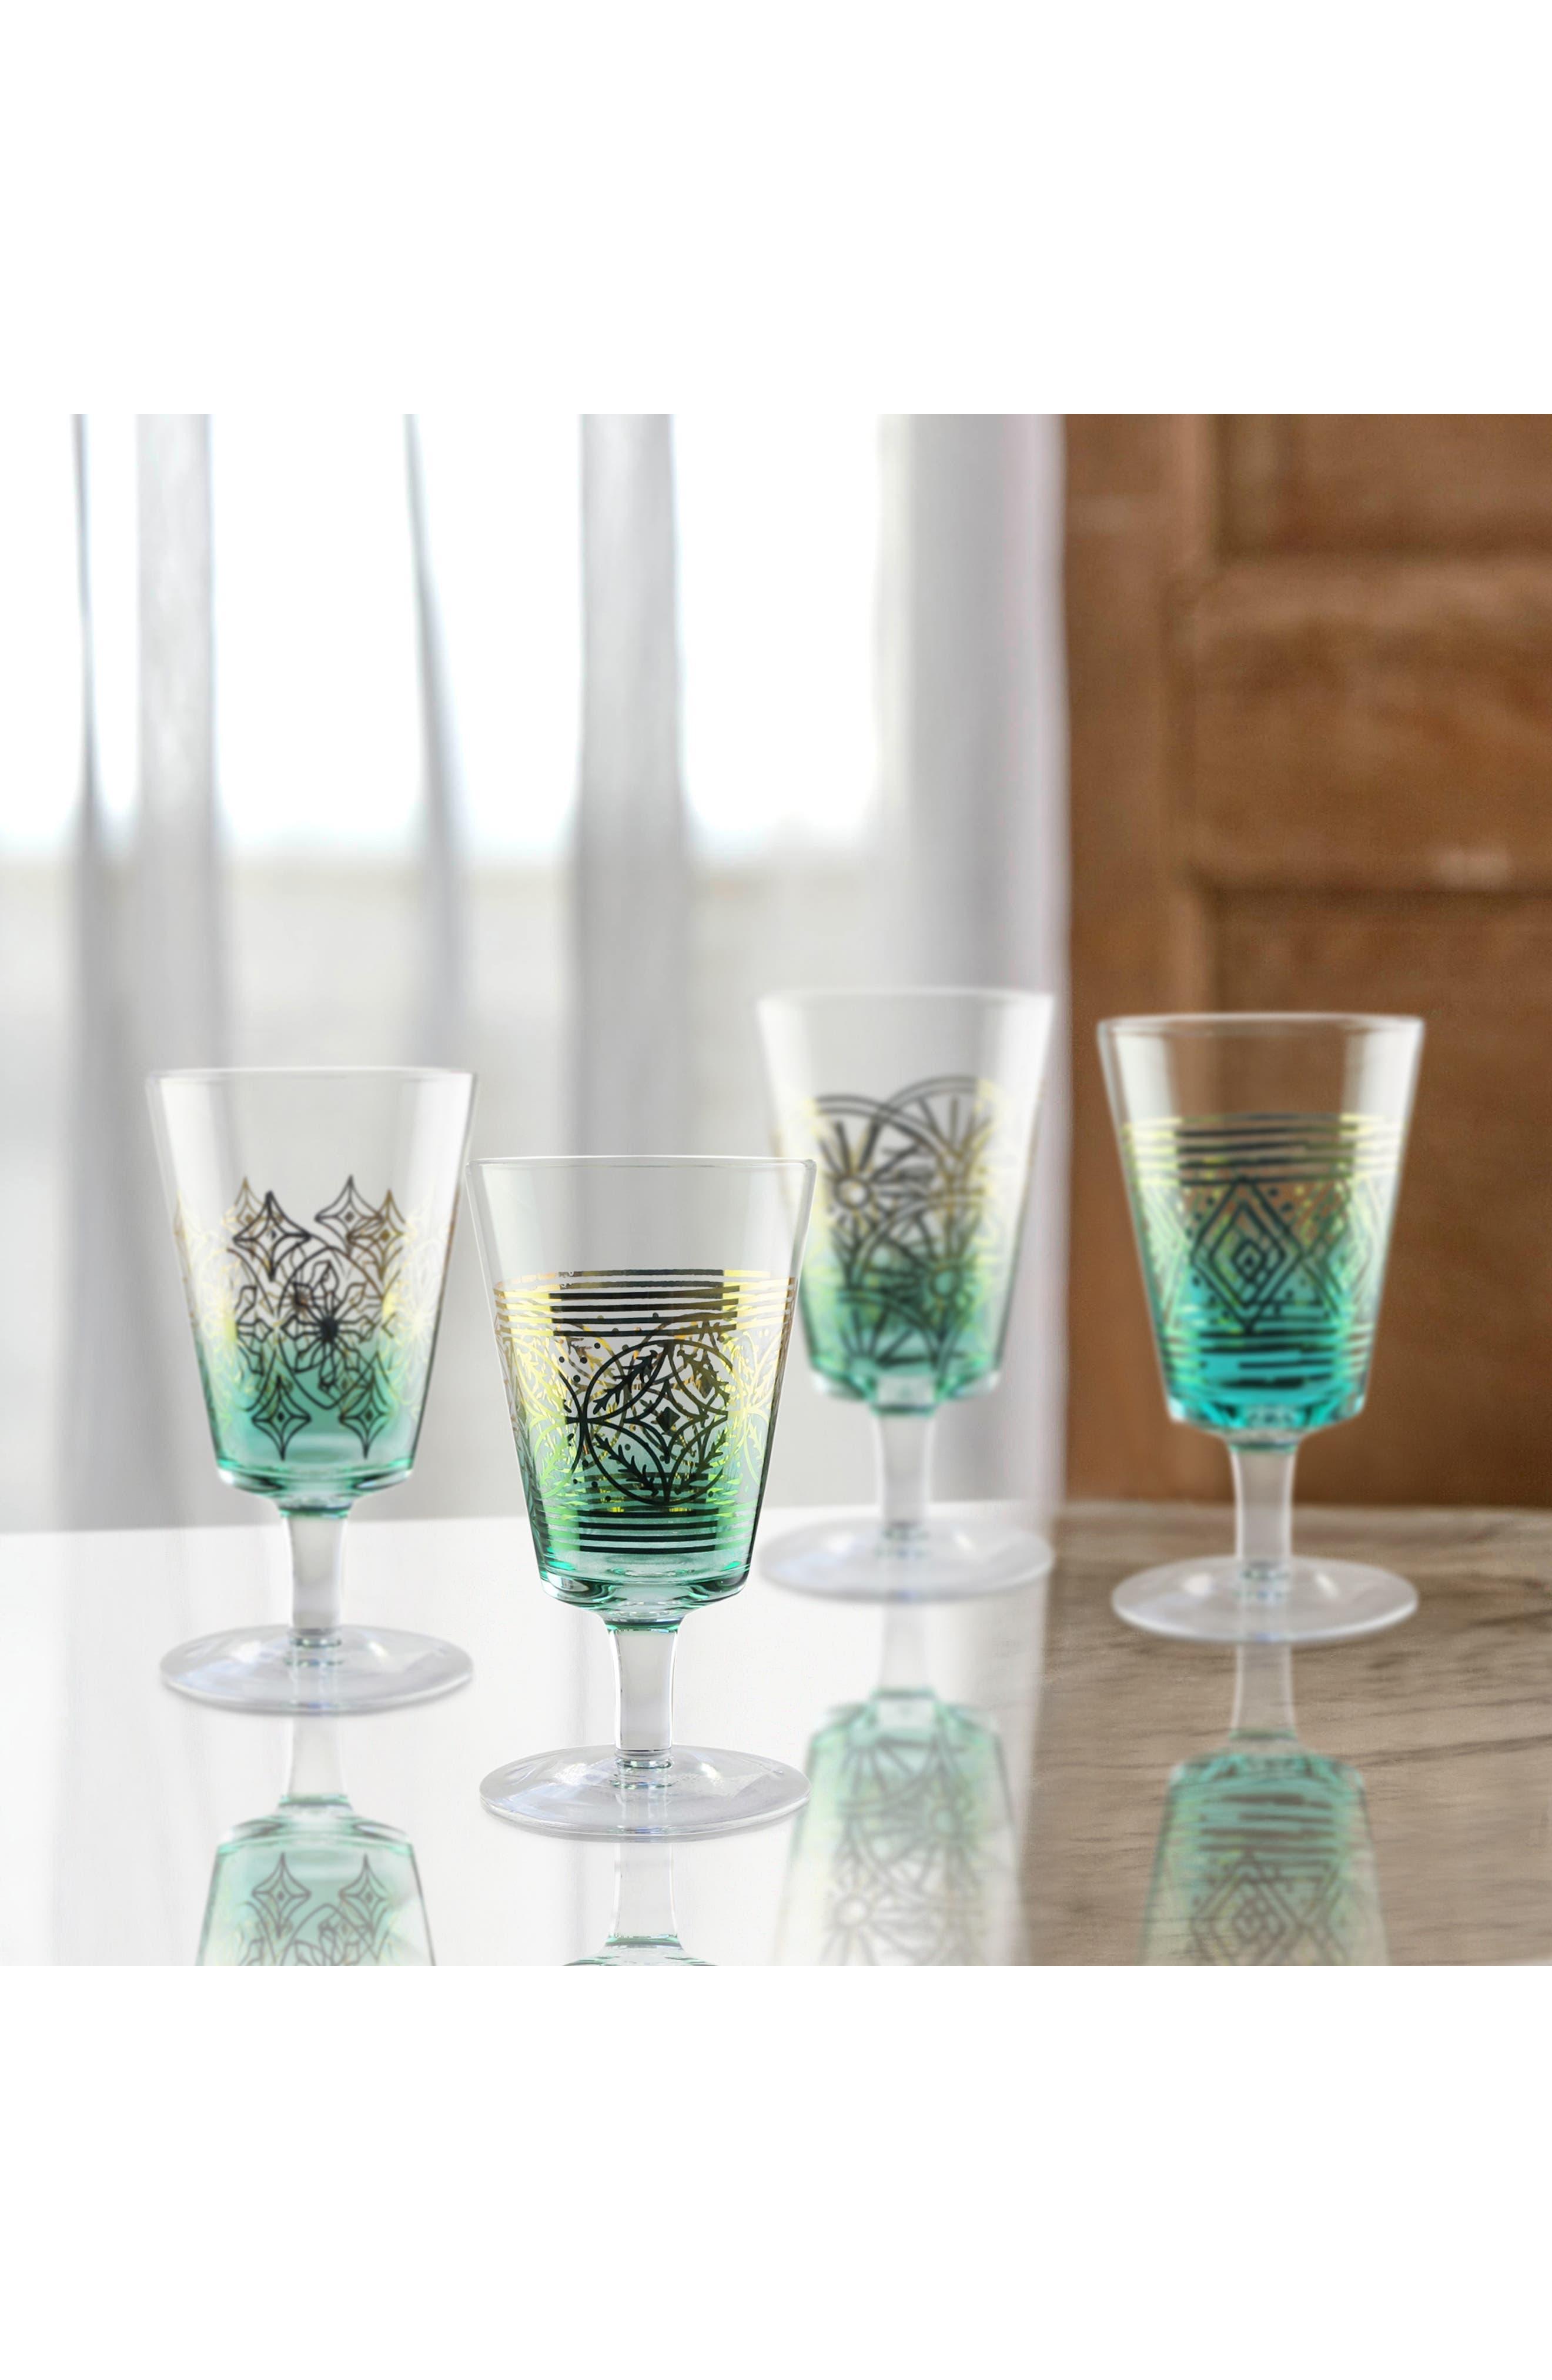 Soirée Set of 4 Wine Glasses,                             Alternate thumbnail 2, color,                             TEAL/ GOLD